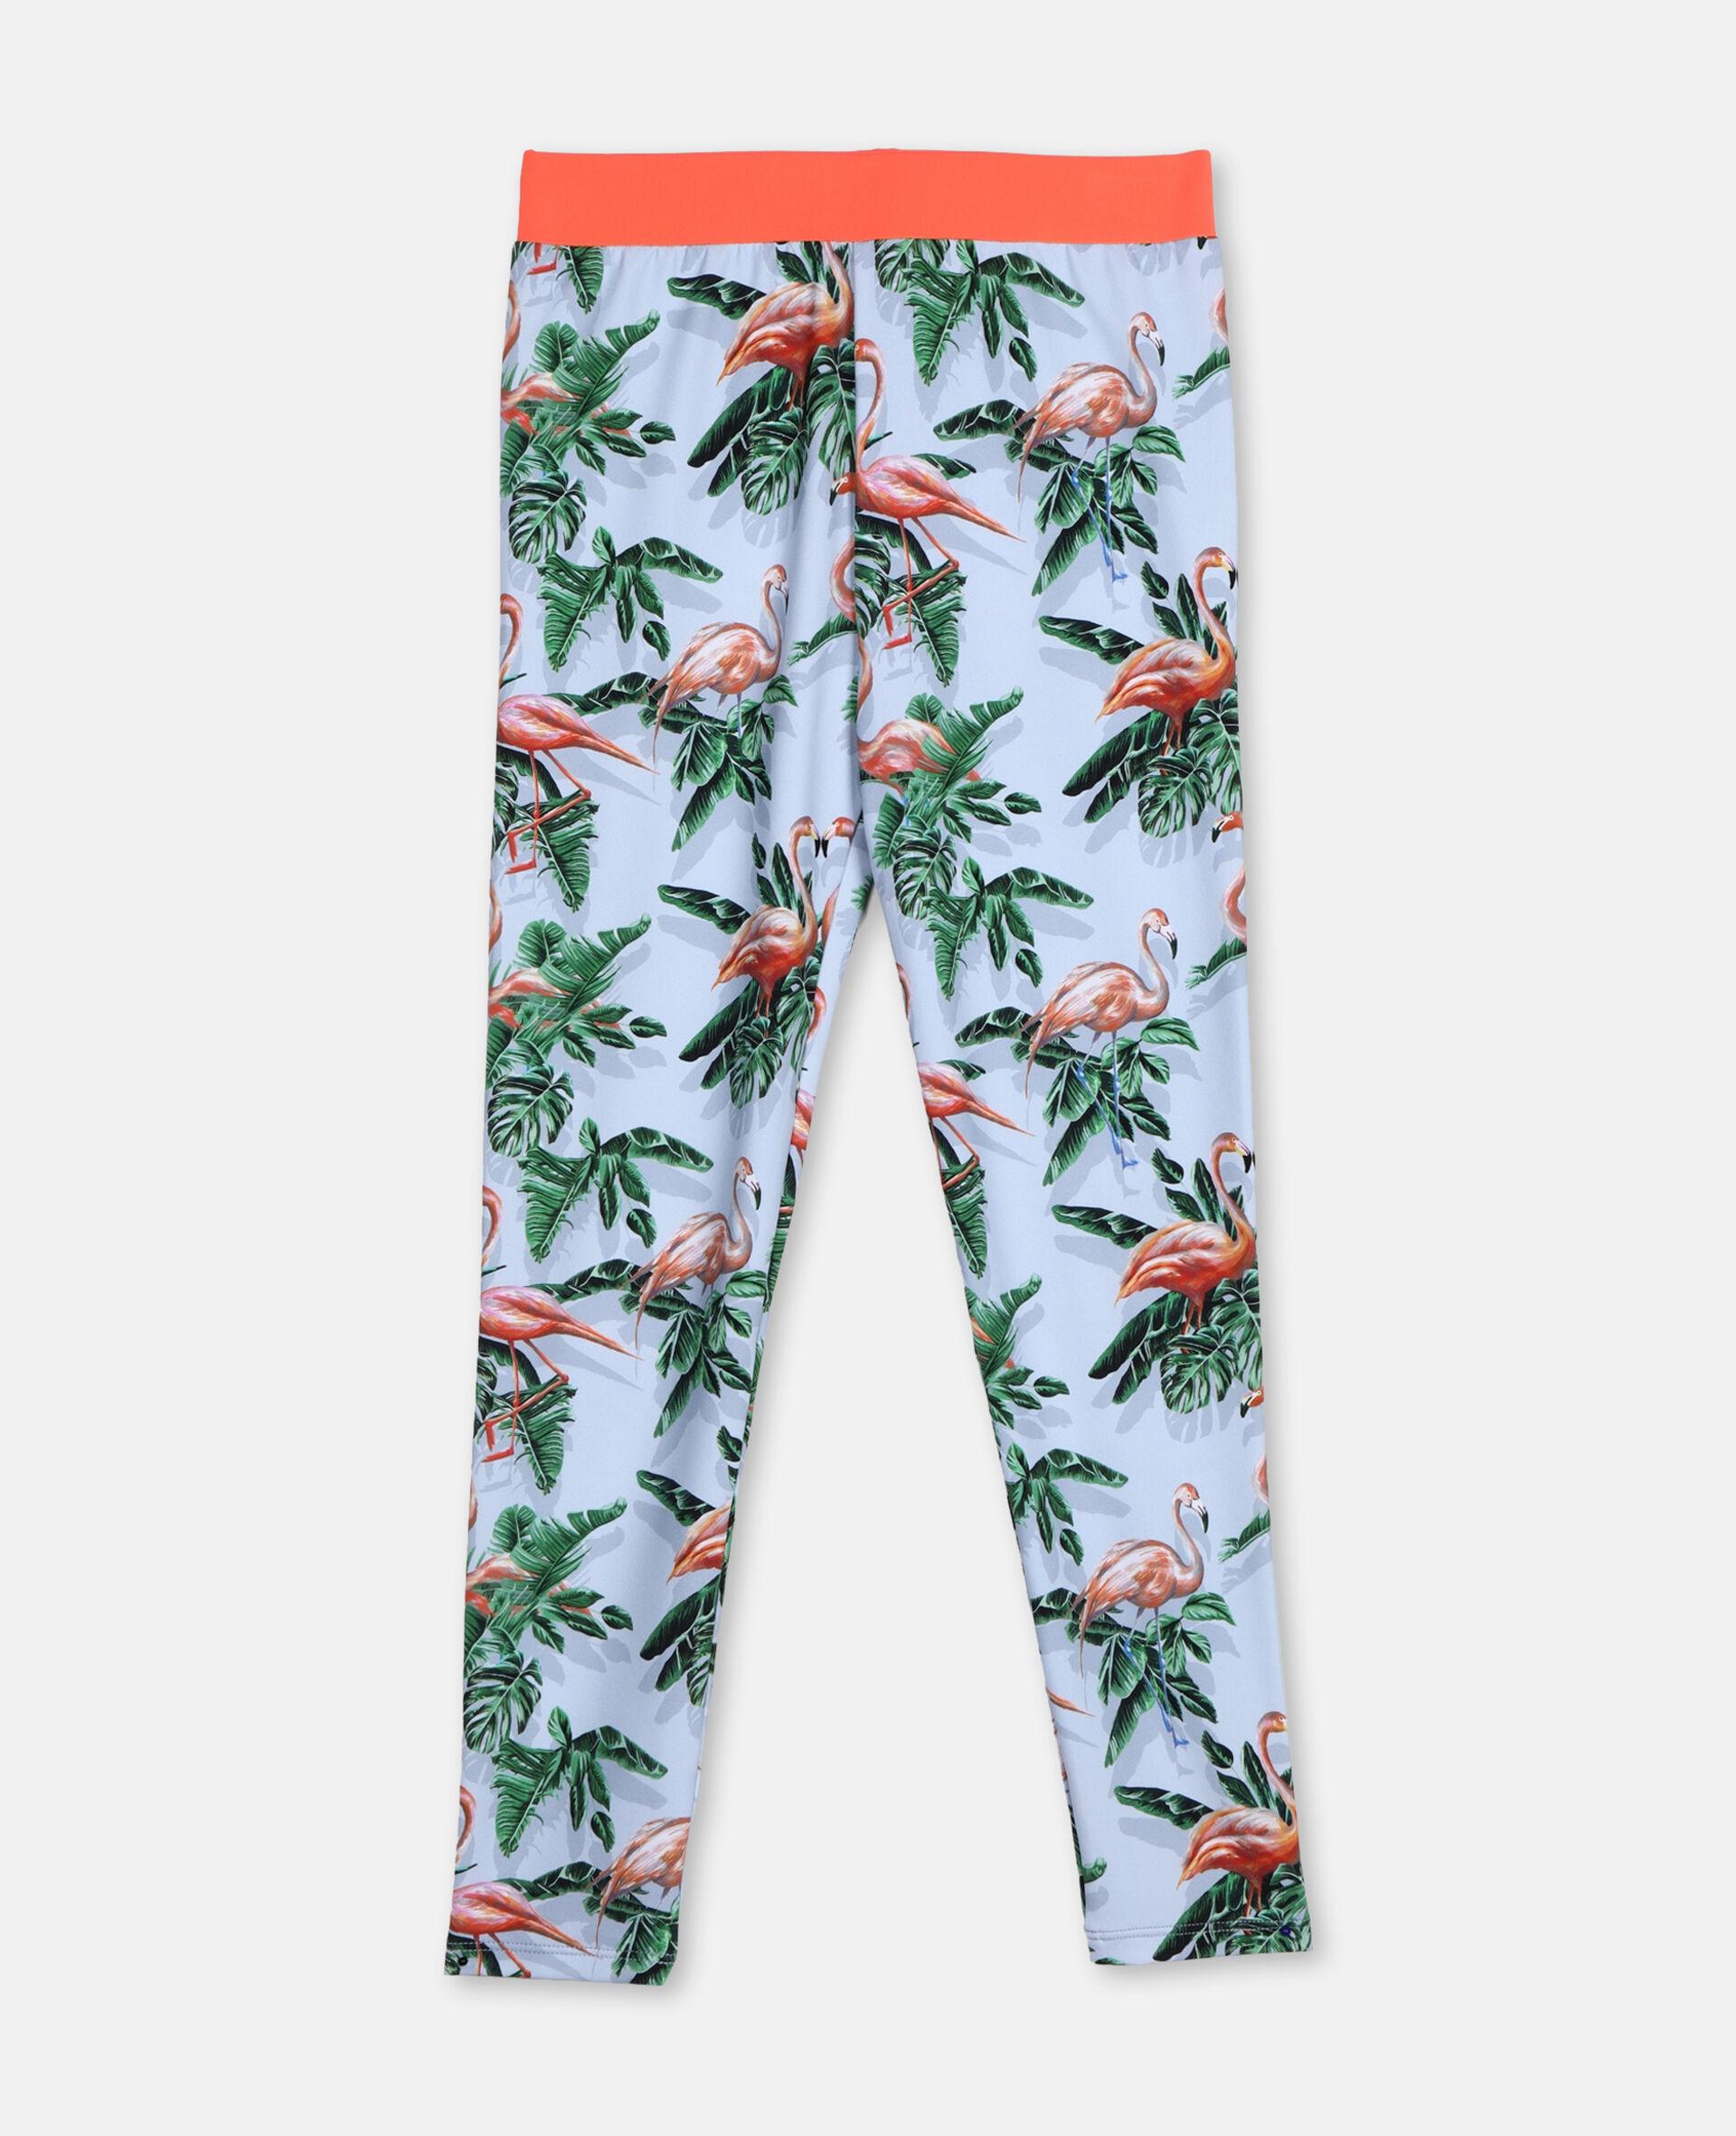 Painty Flamingo贴腿裤-绿色-large image number 0